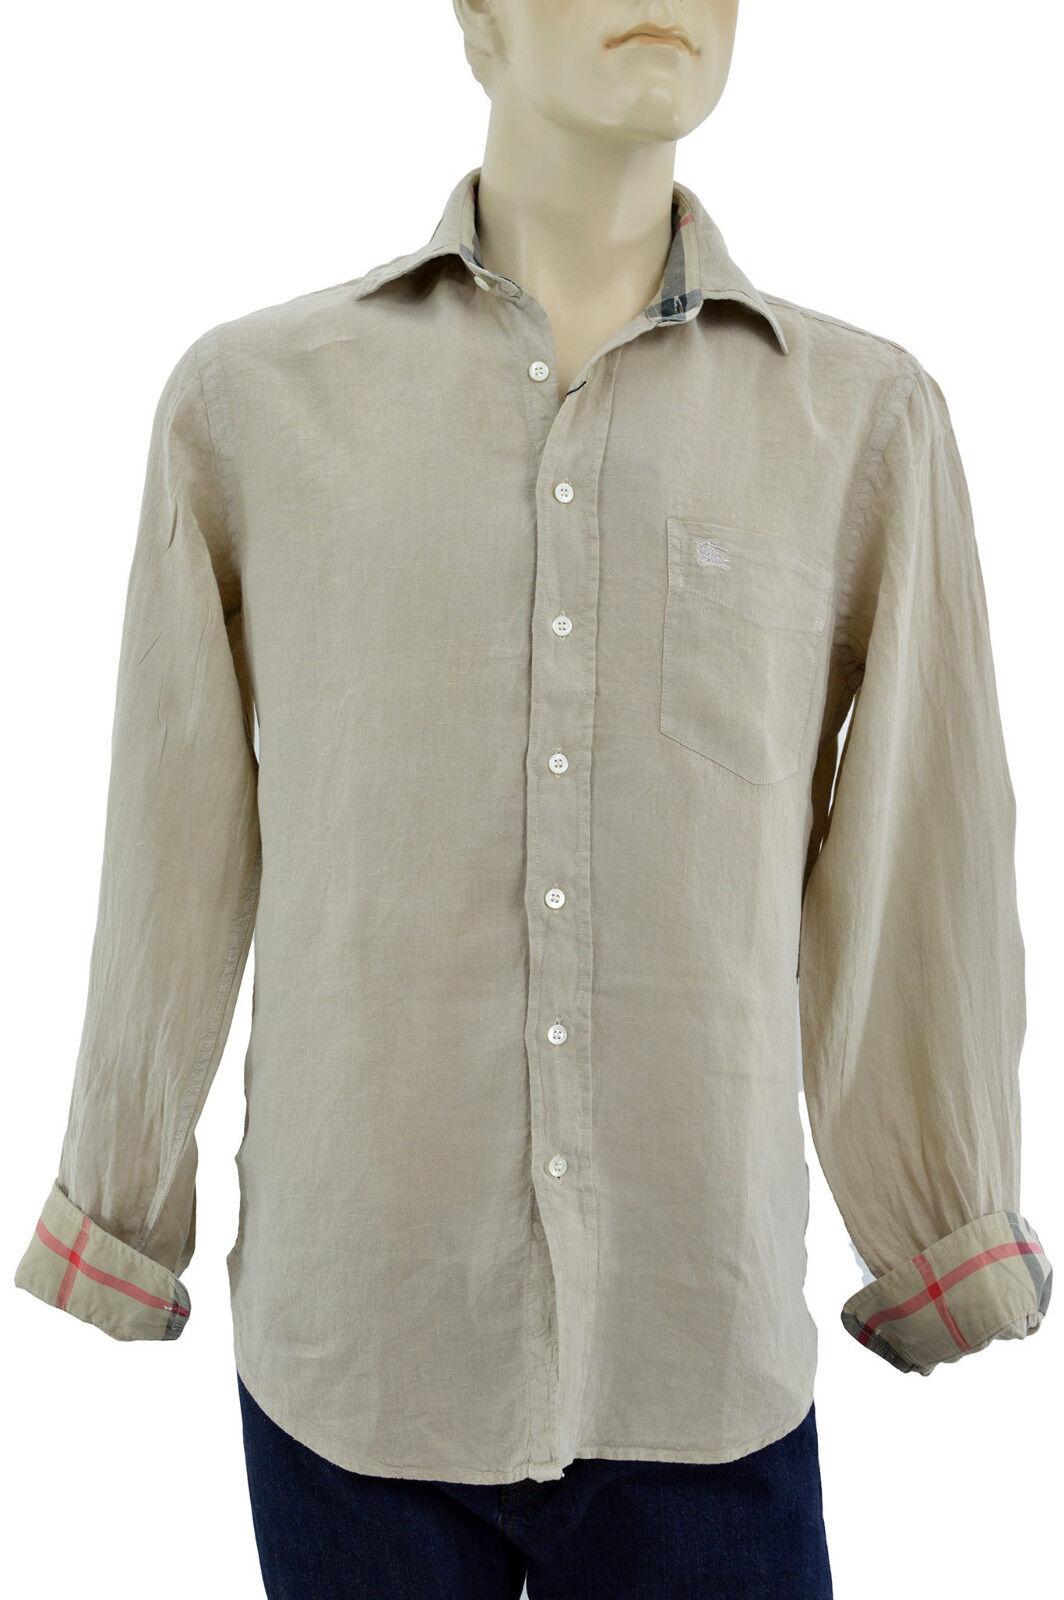 275 Burberry London Trench Linen Casual Dress Men 39 S Shirt